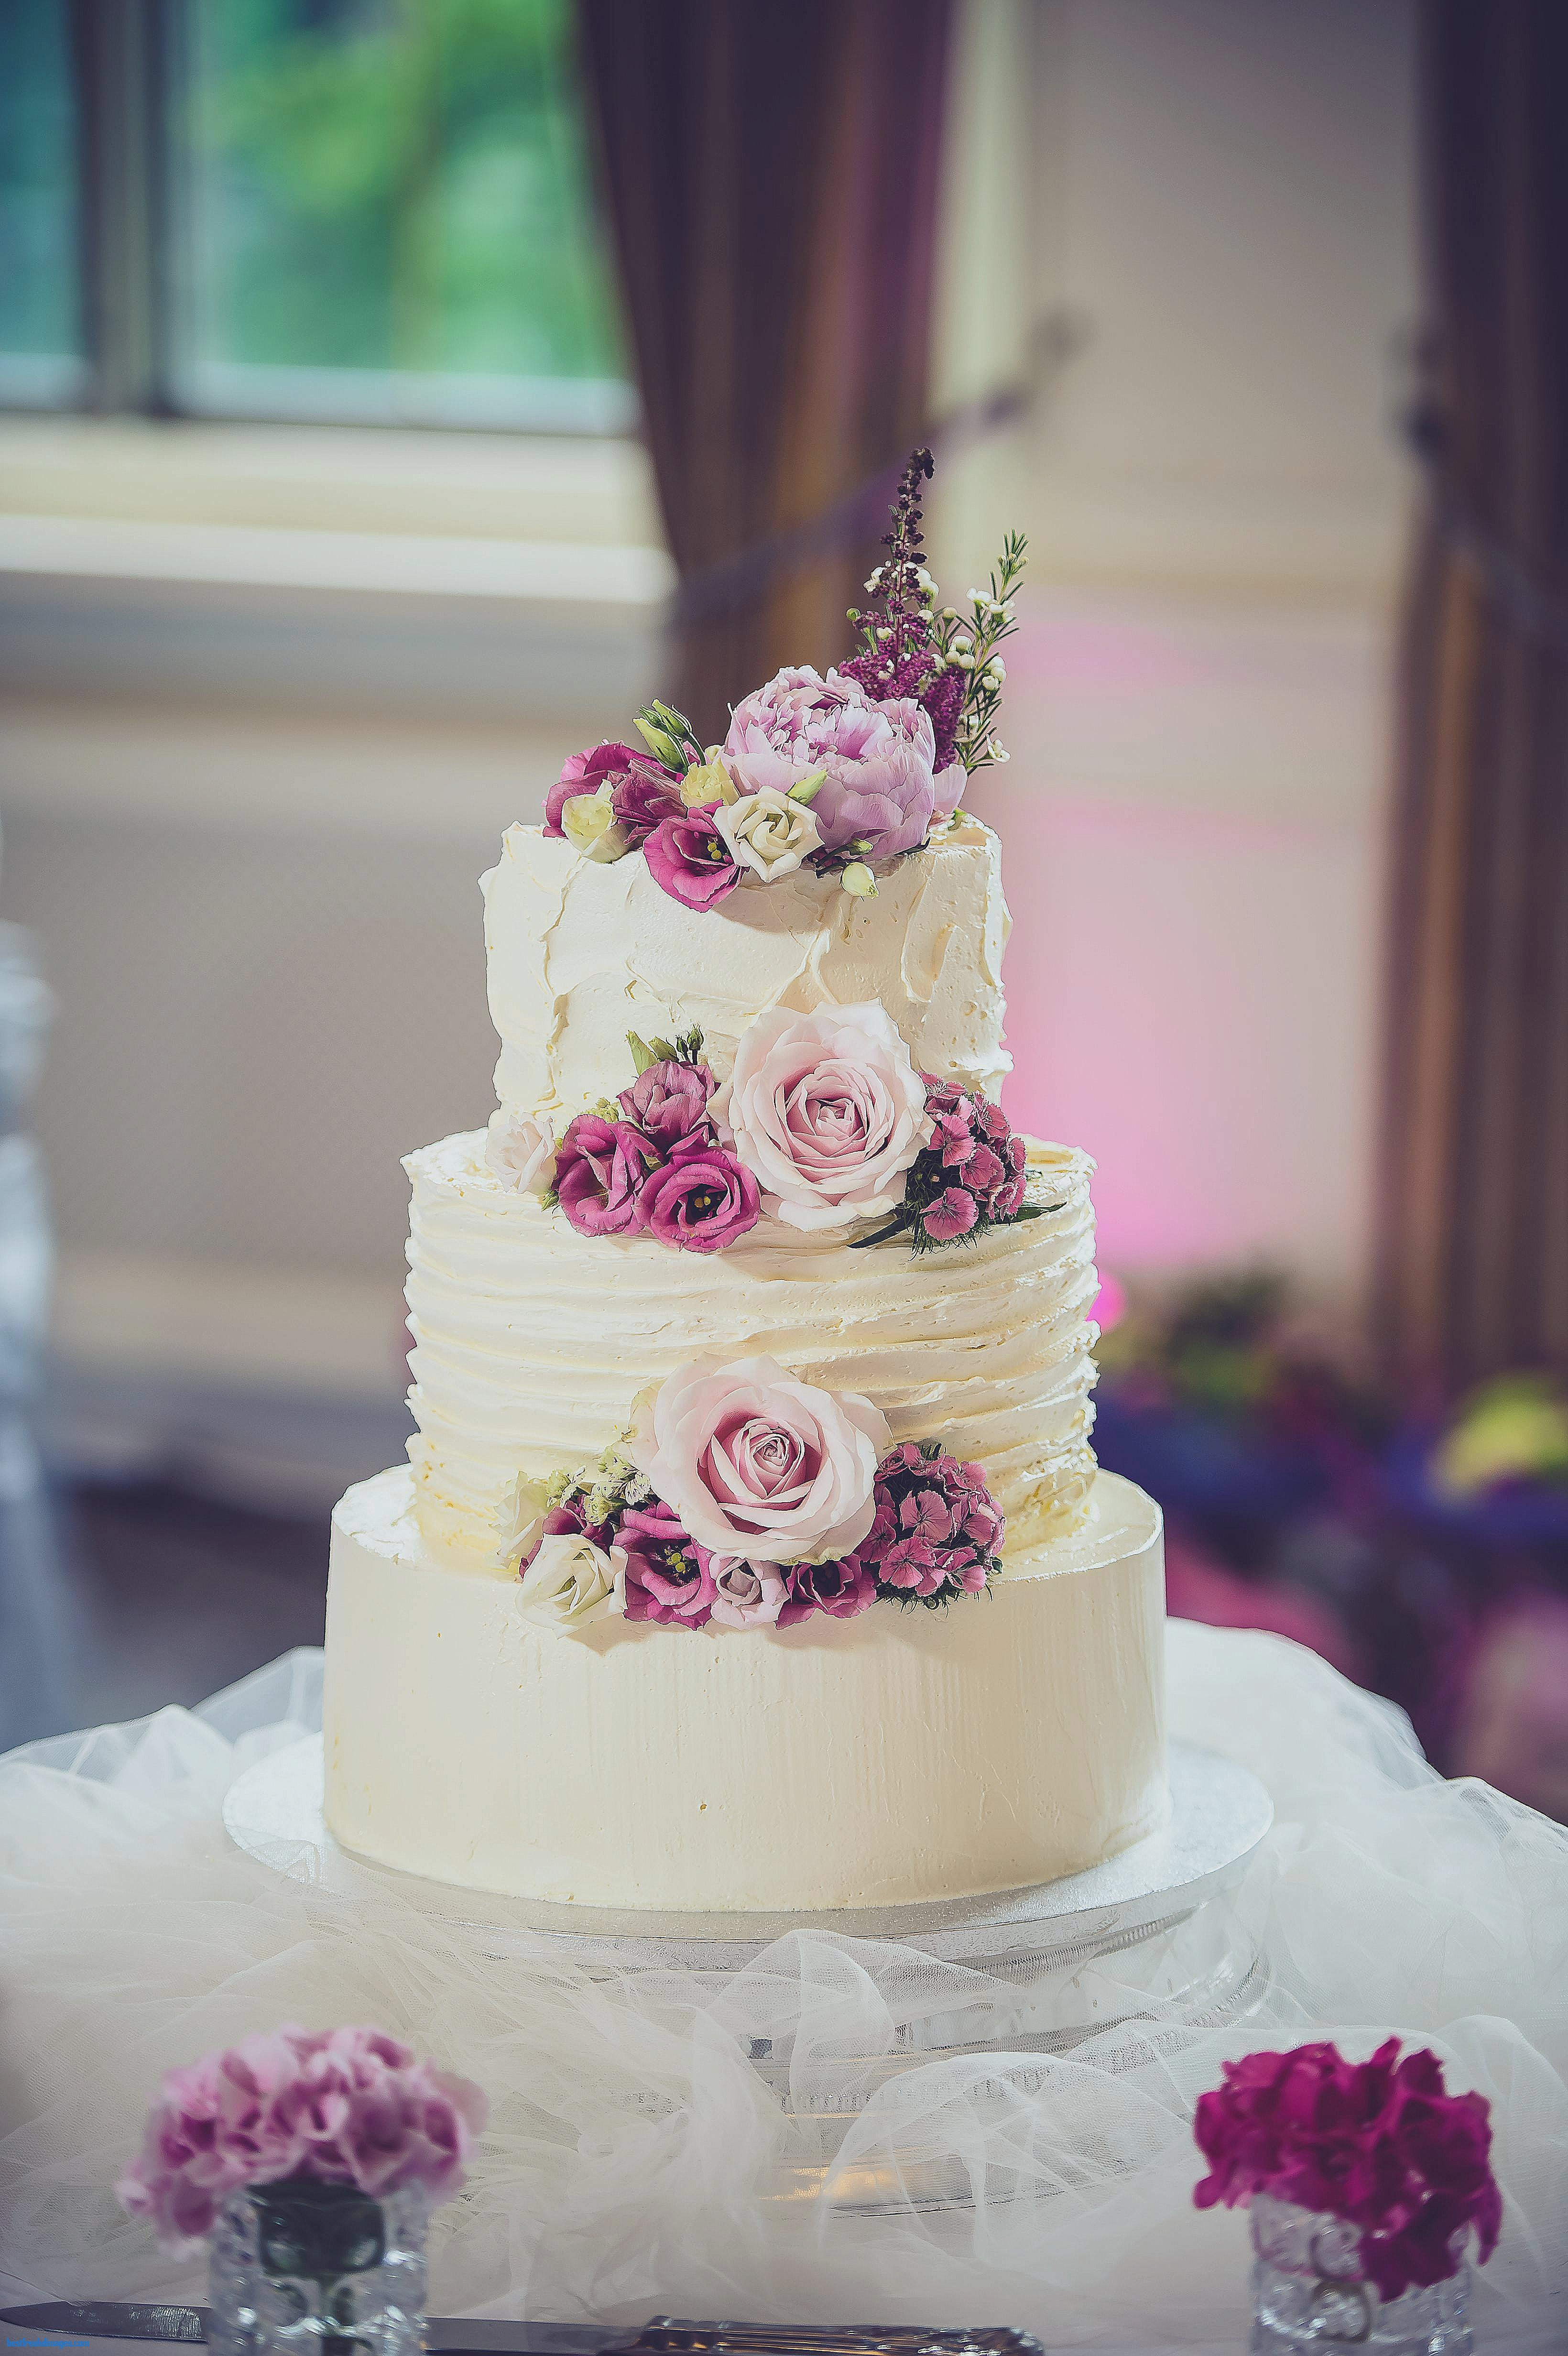 Best Wedding Cake Recipes  Best Wedding Cake Recipes